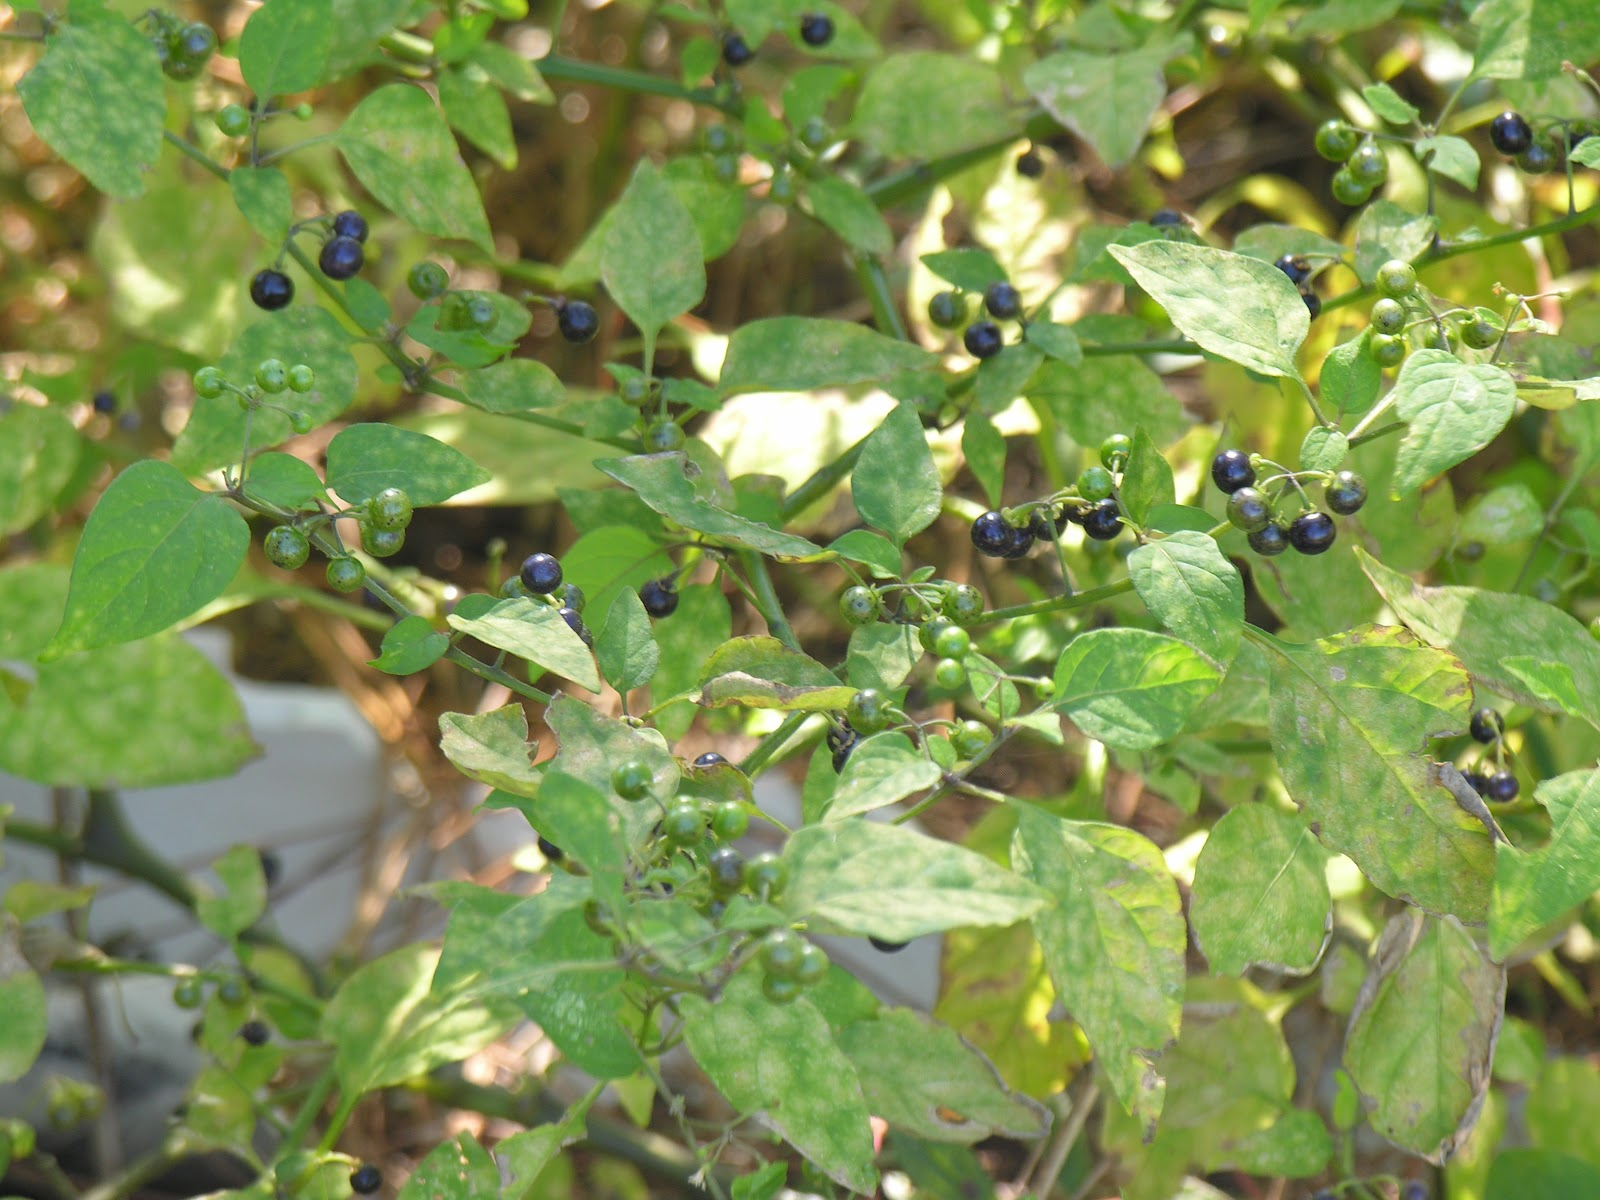 Michael Porter, Equine Veterinarian: Poisonous Plants Quiz